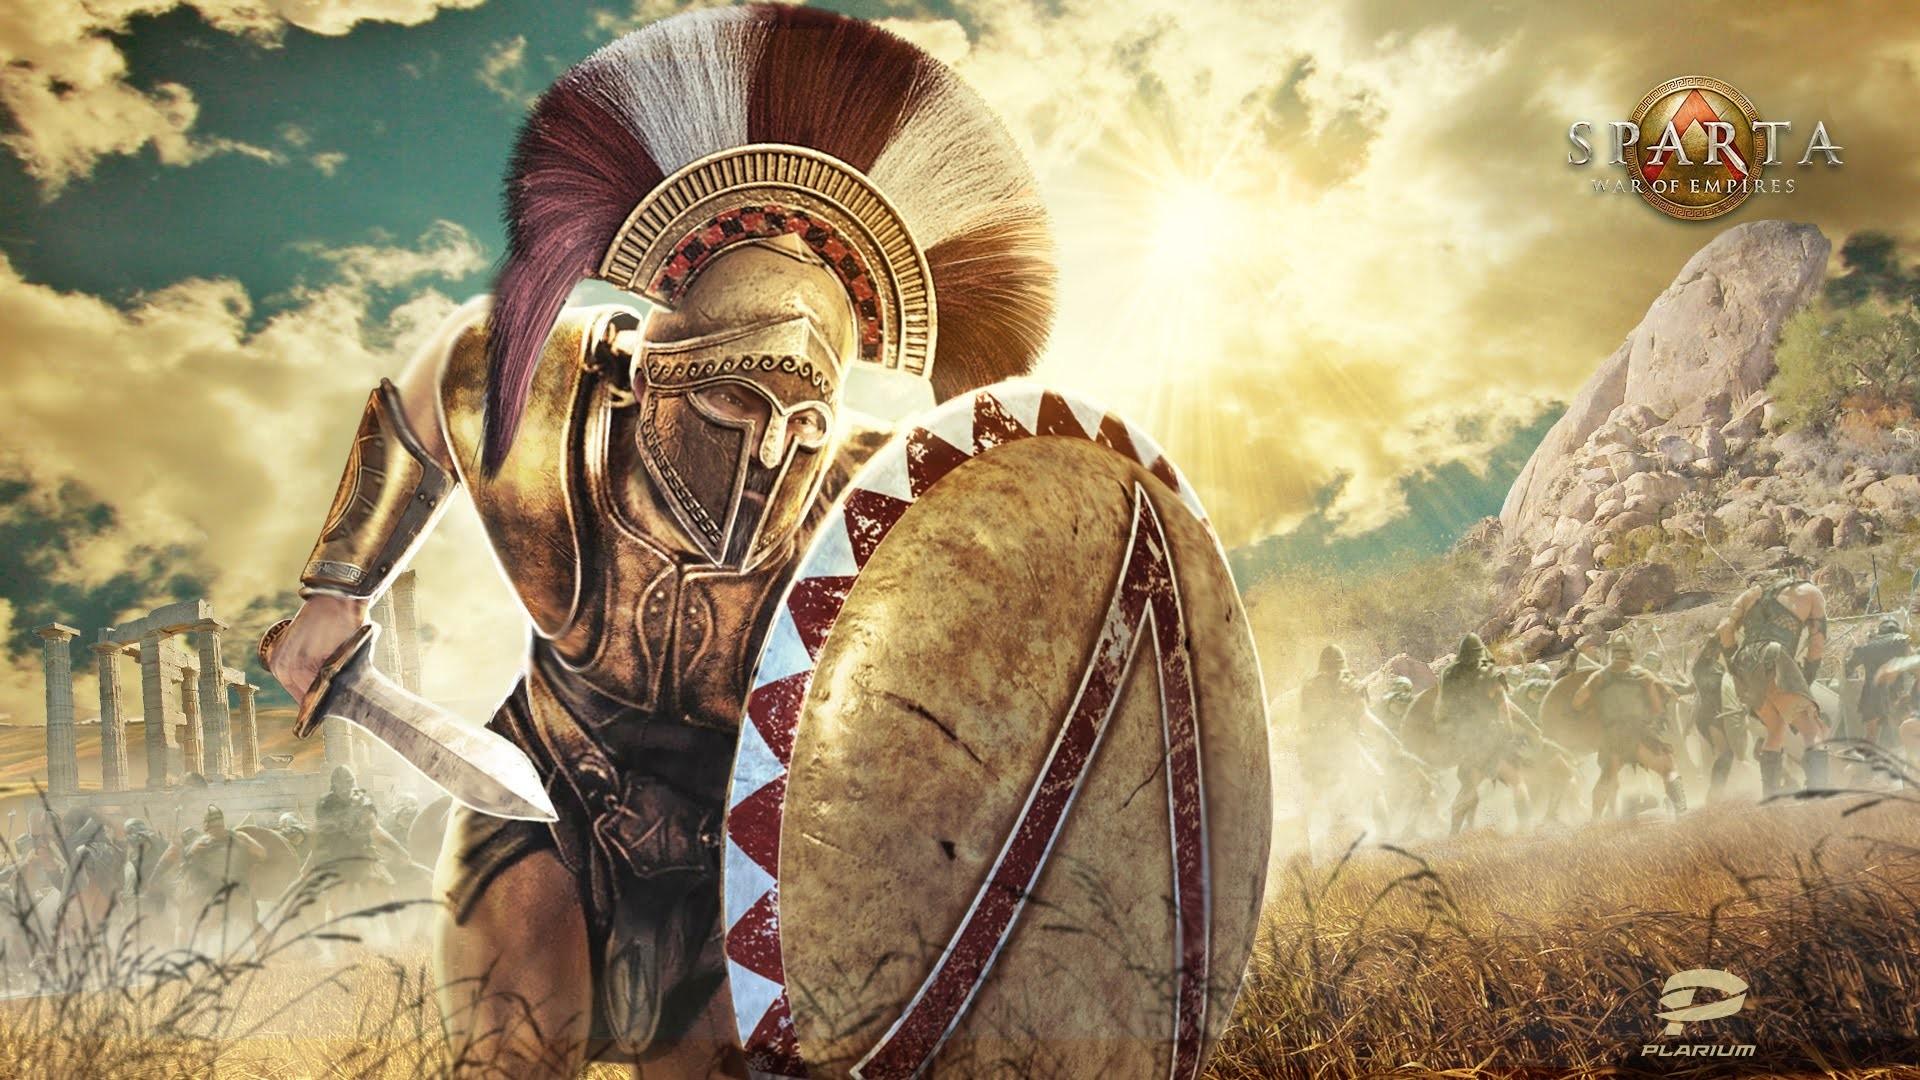 Spartan Warrior Wallpaper